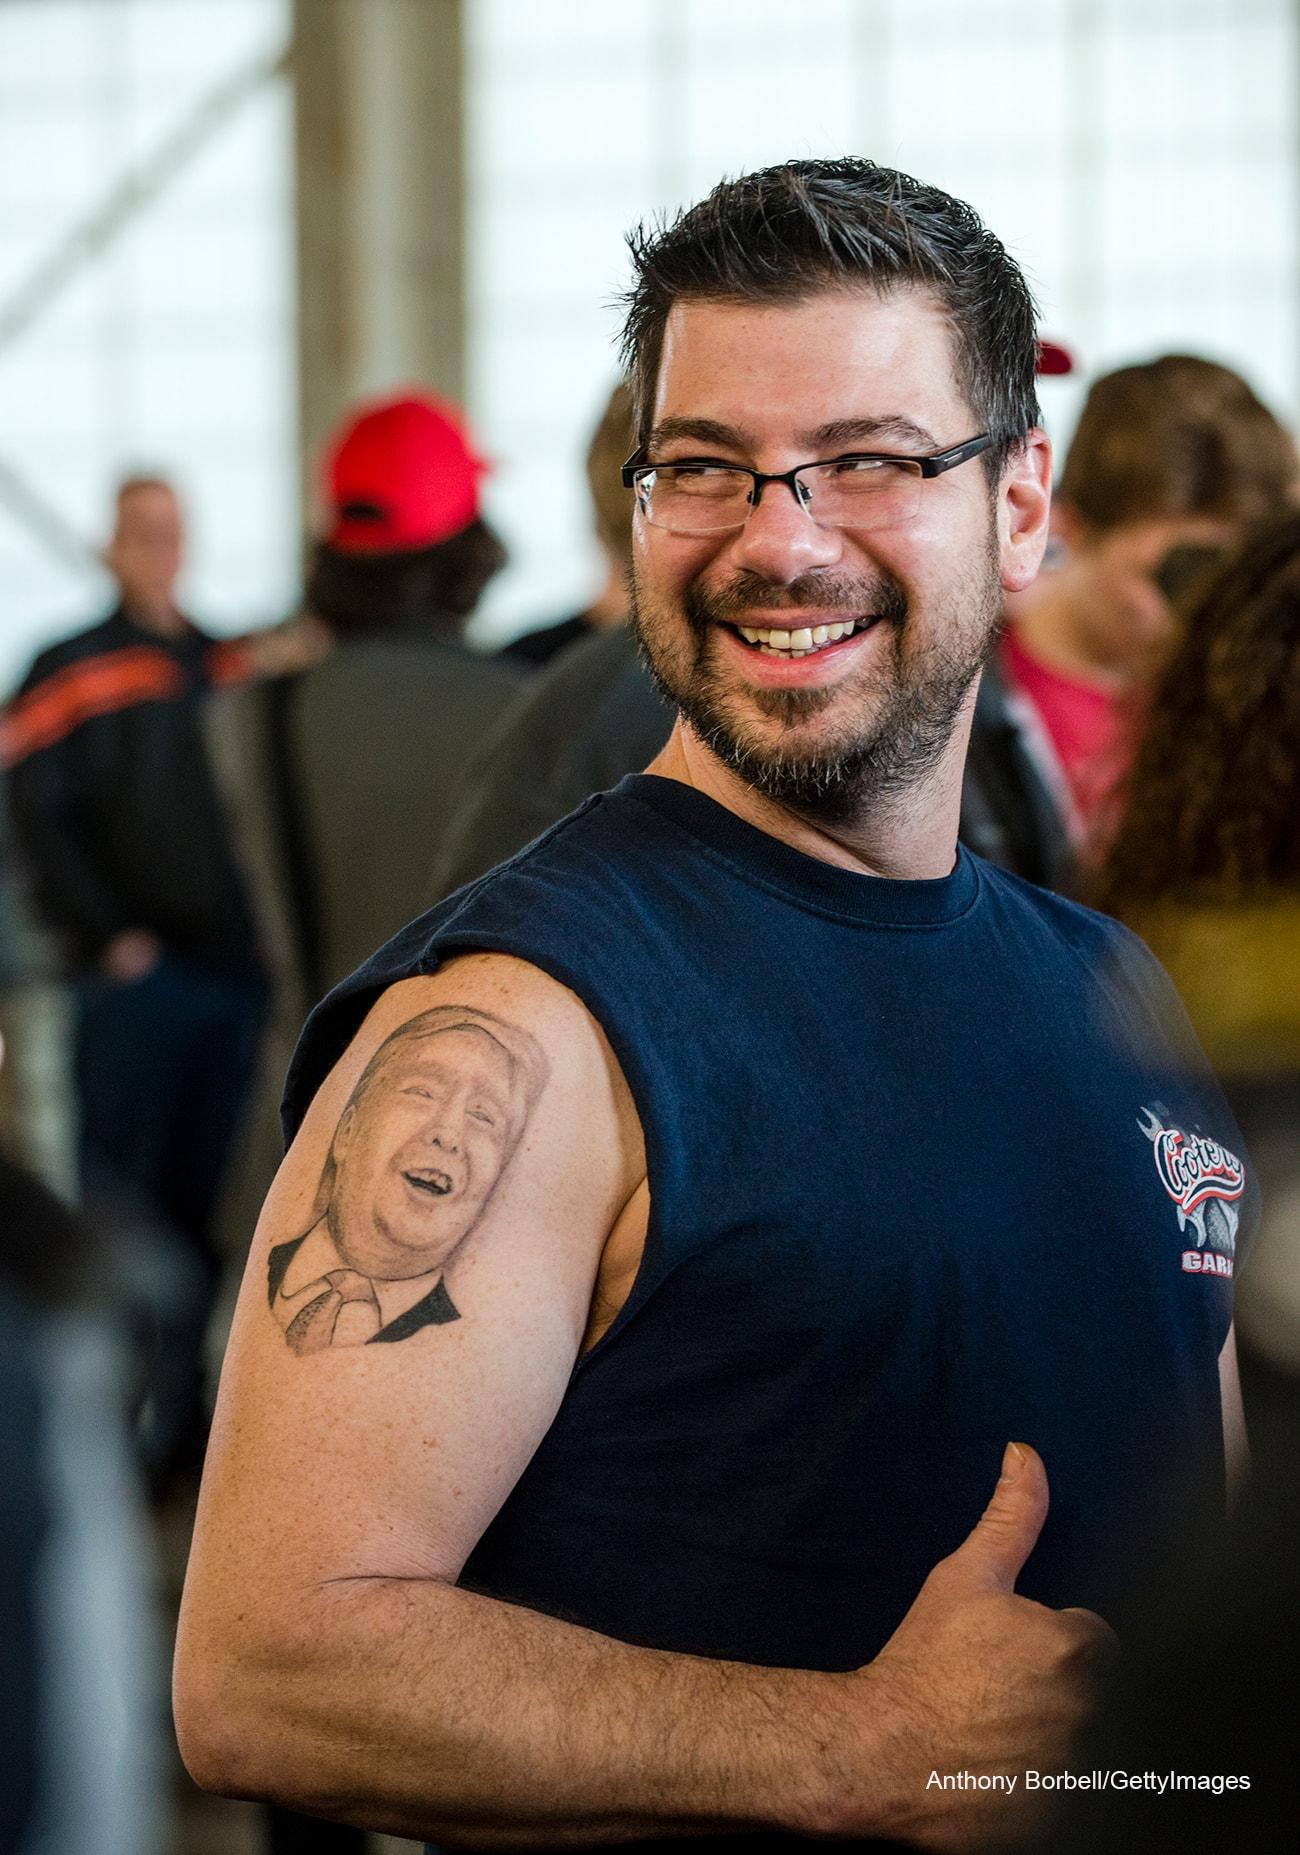 татуировка трамп